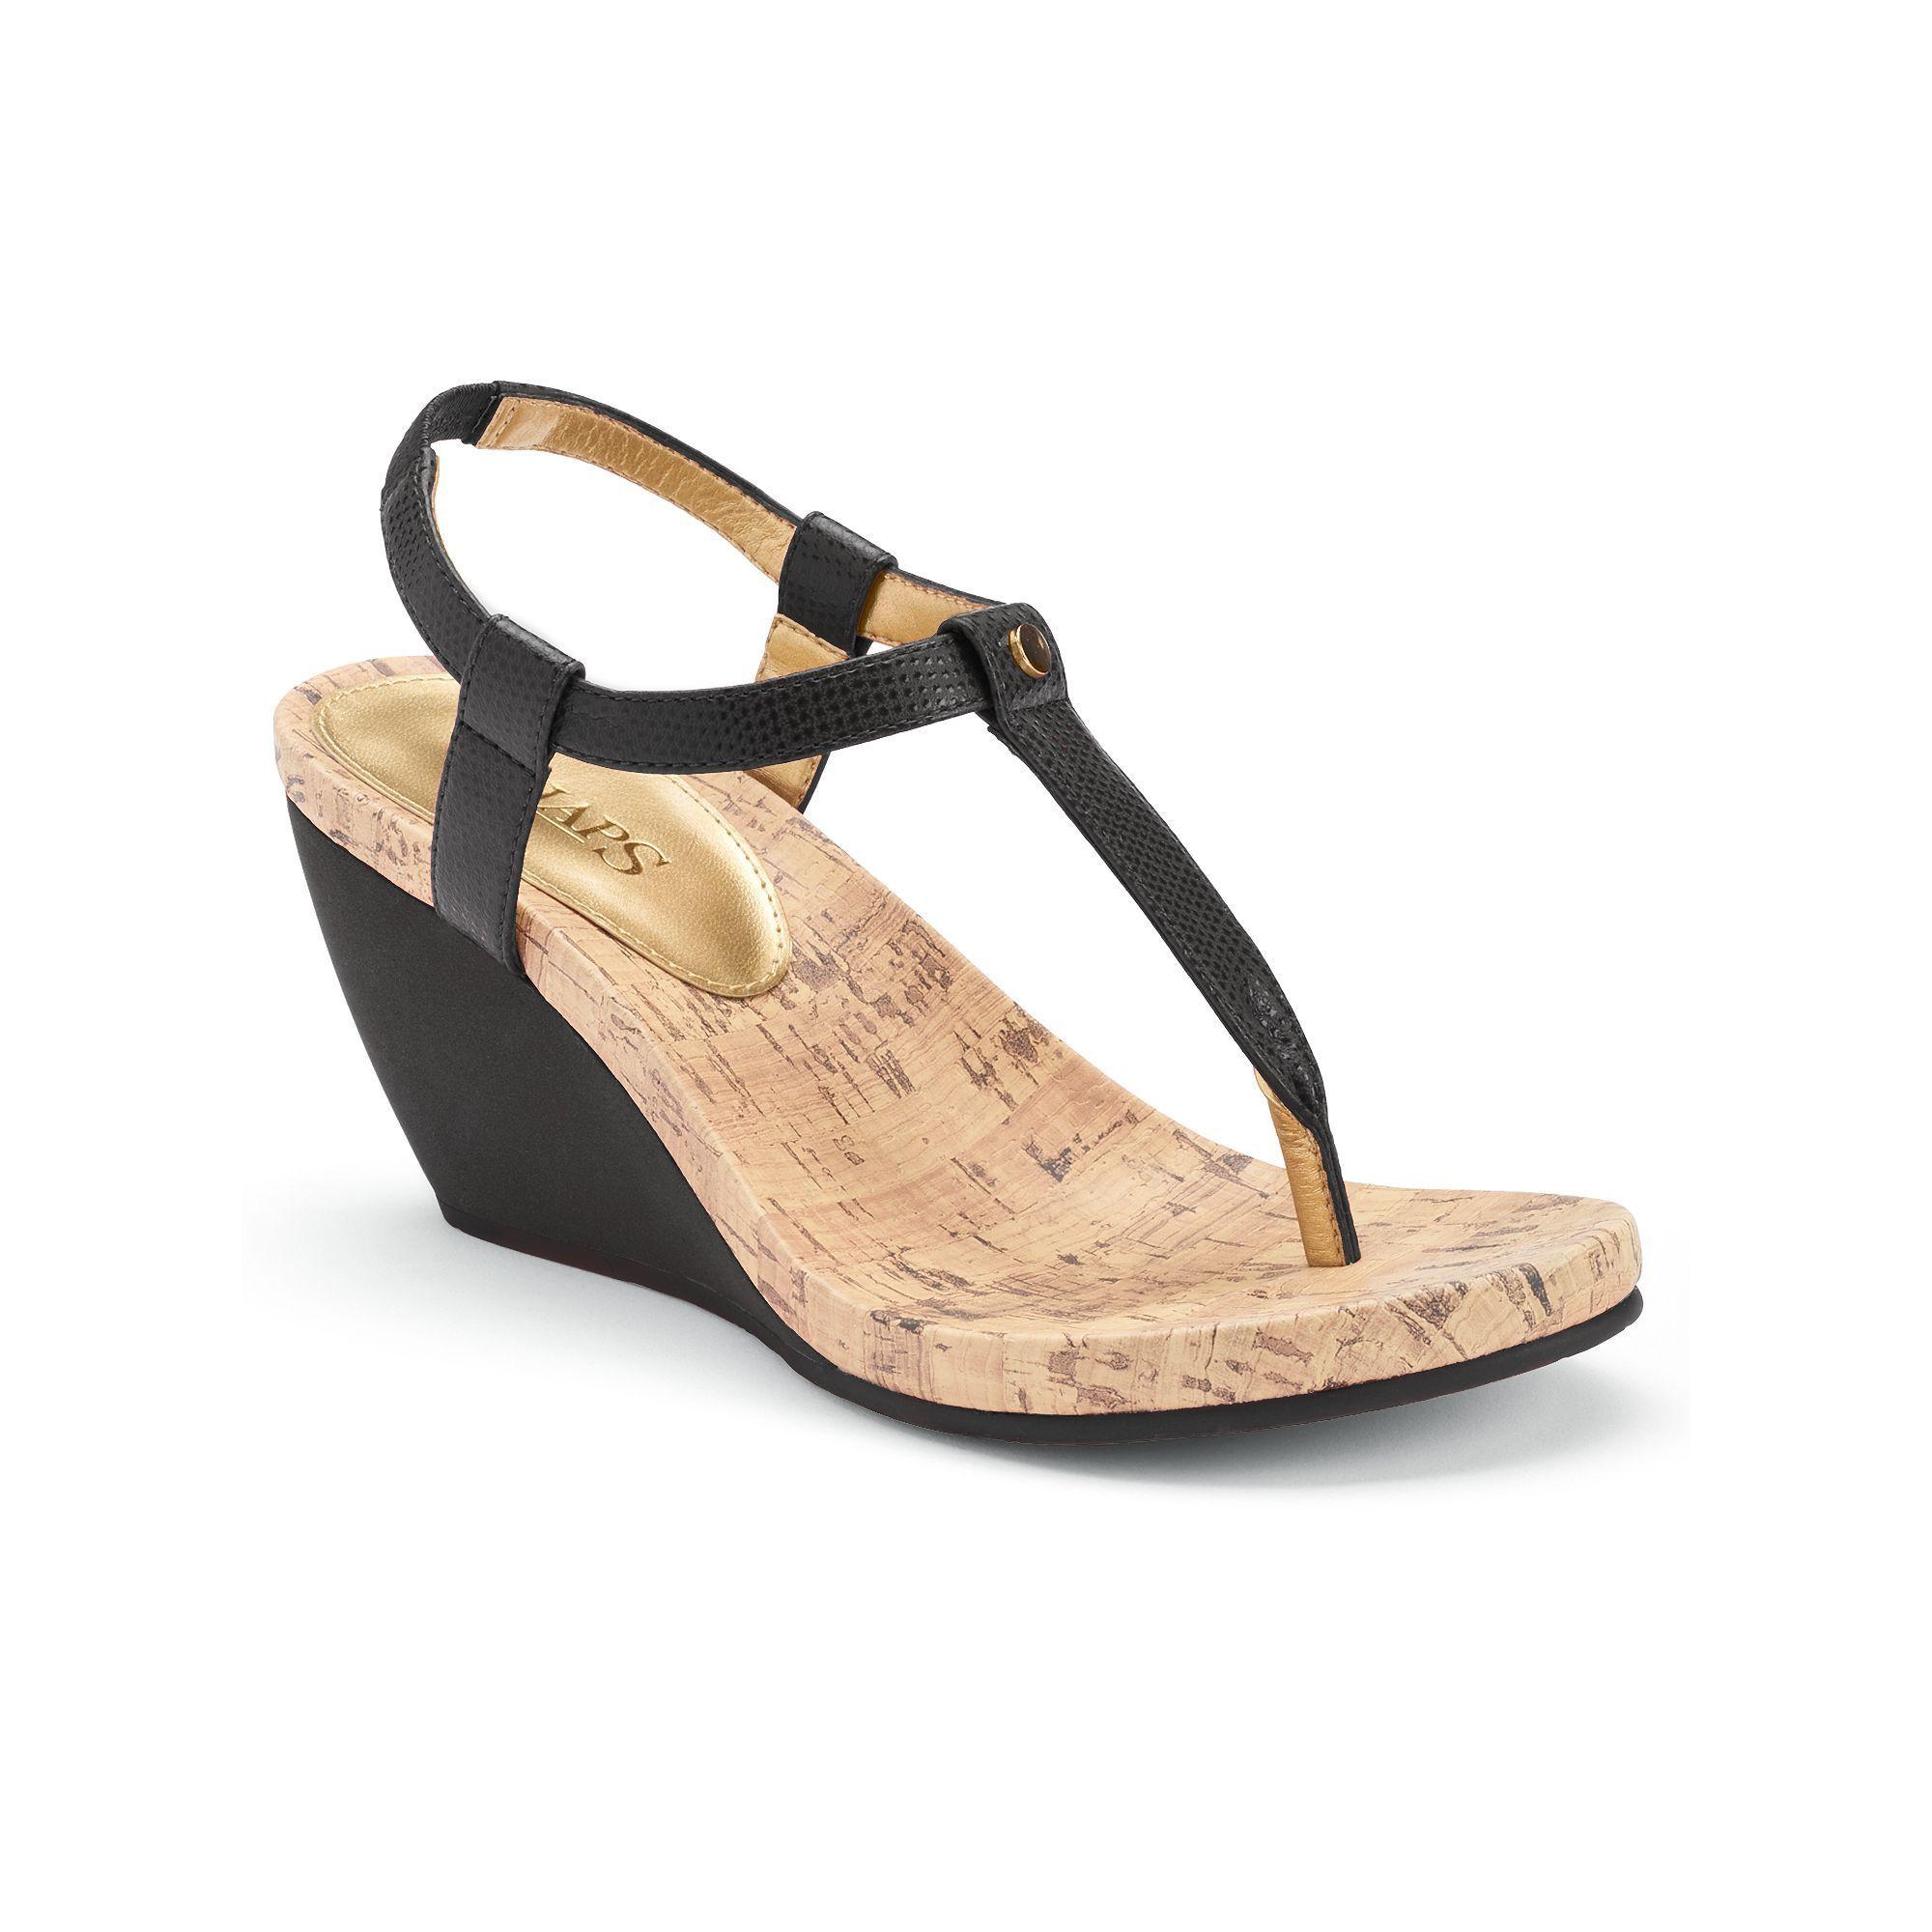 feaec554d154 Chaps Raevyn Women s Slip-On Wedge Sandals